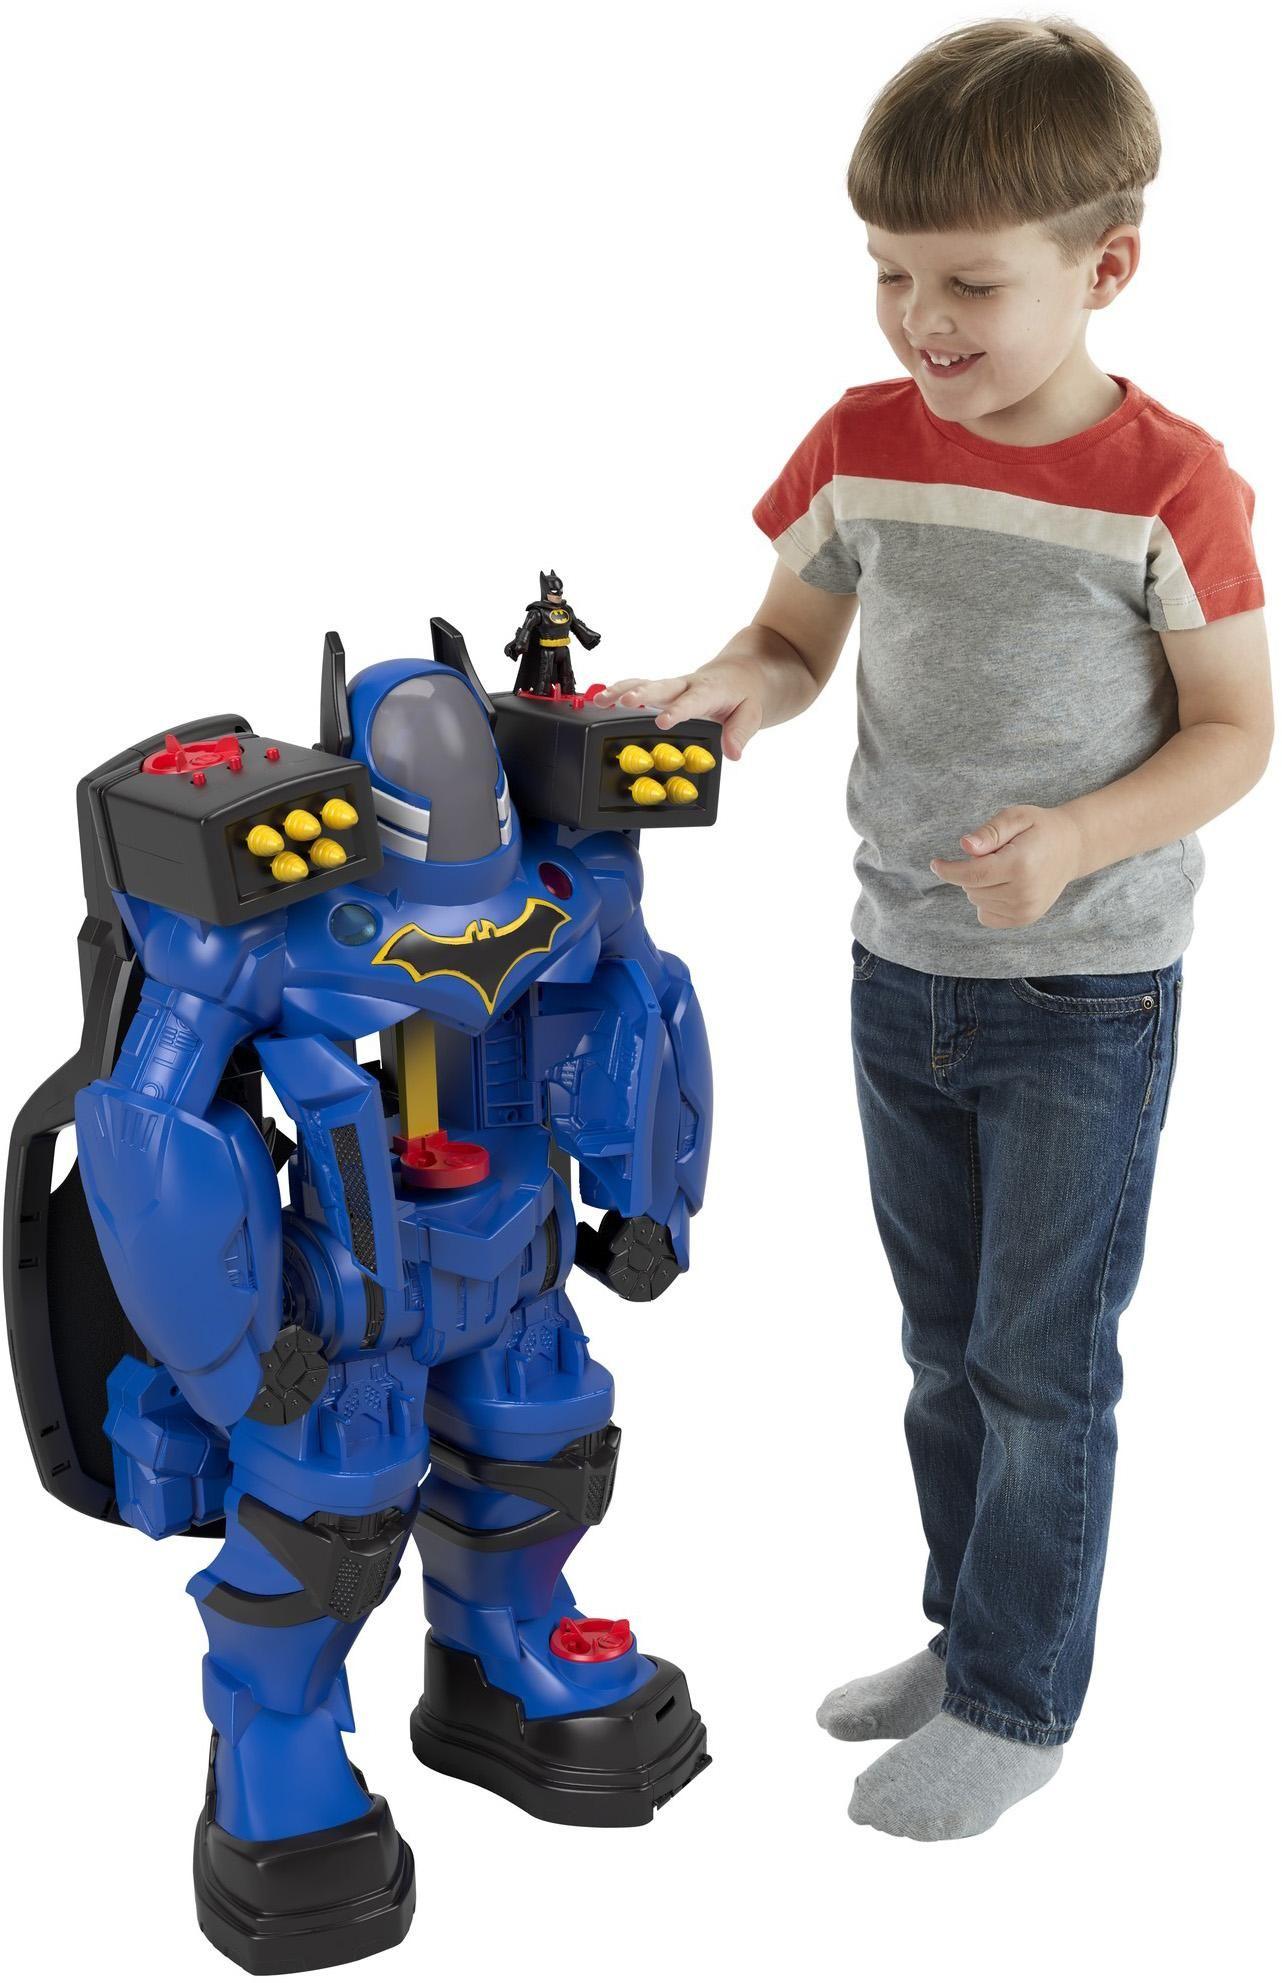 Fisherprice imaginext dc super friends batbot